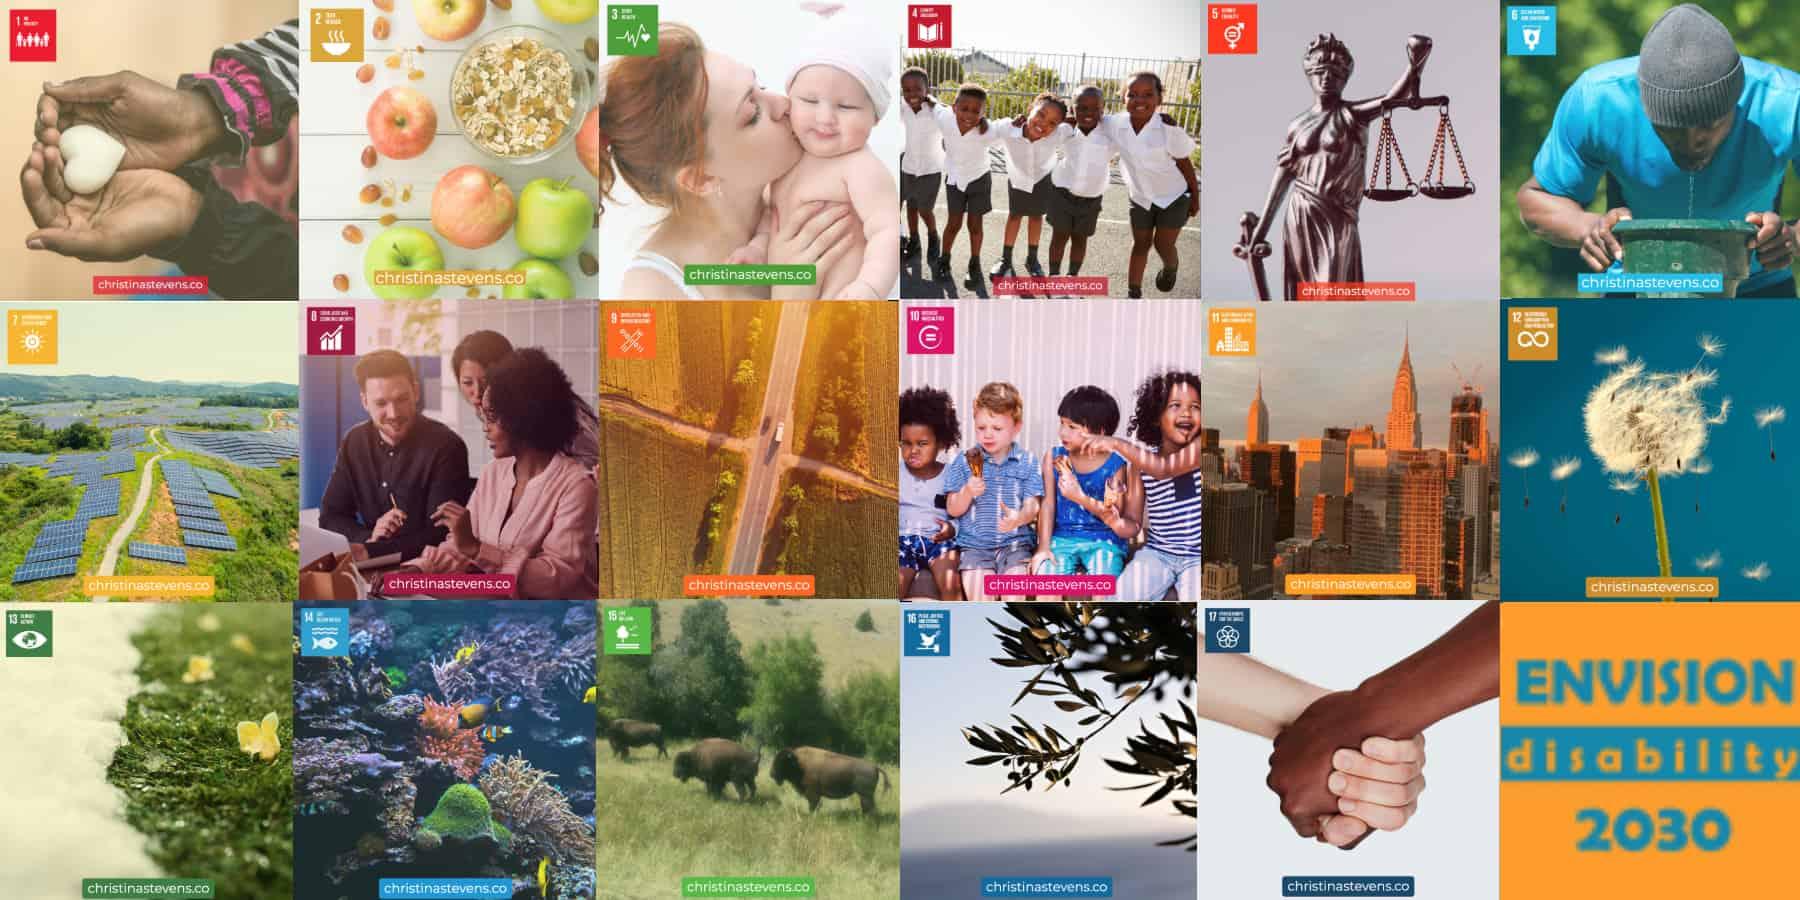 CS-UN collage